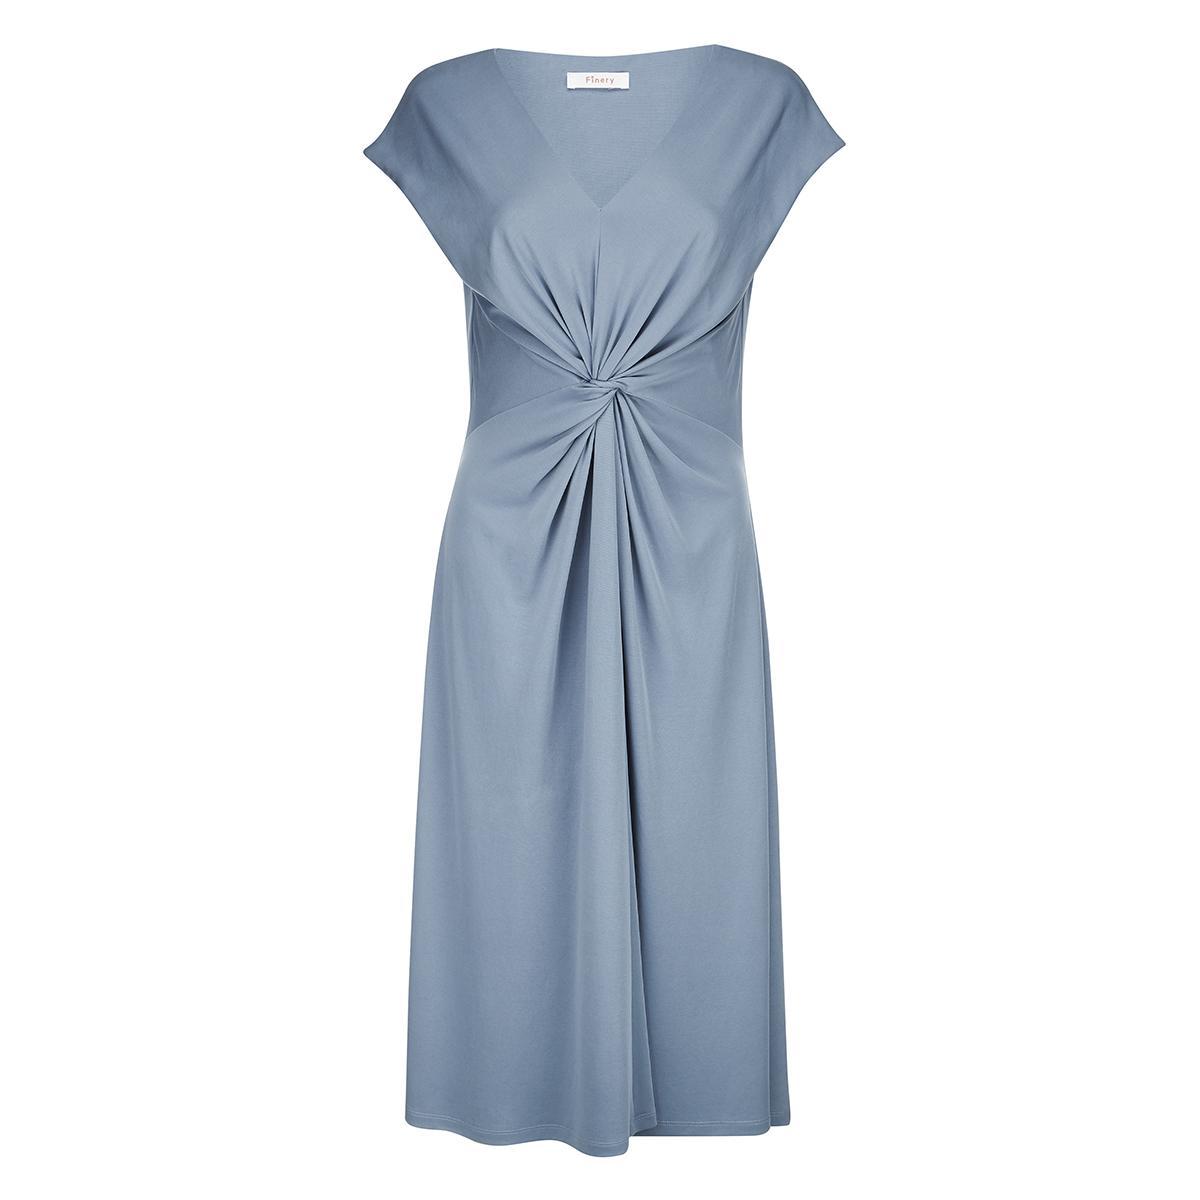 Caledonian Dusky Blue Twist Front Dress Finery QEXaRrXMwX